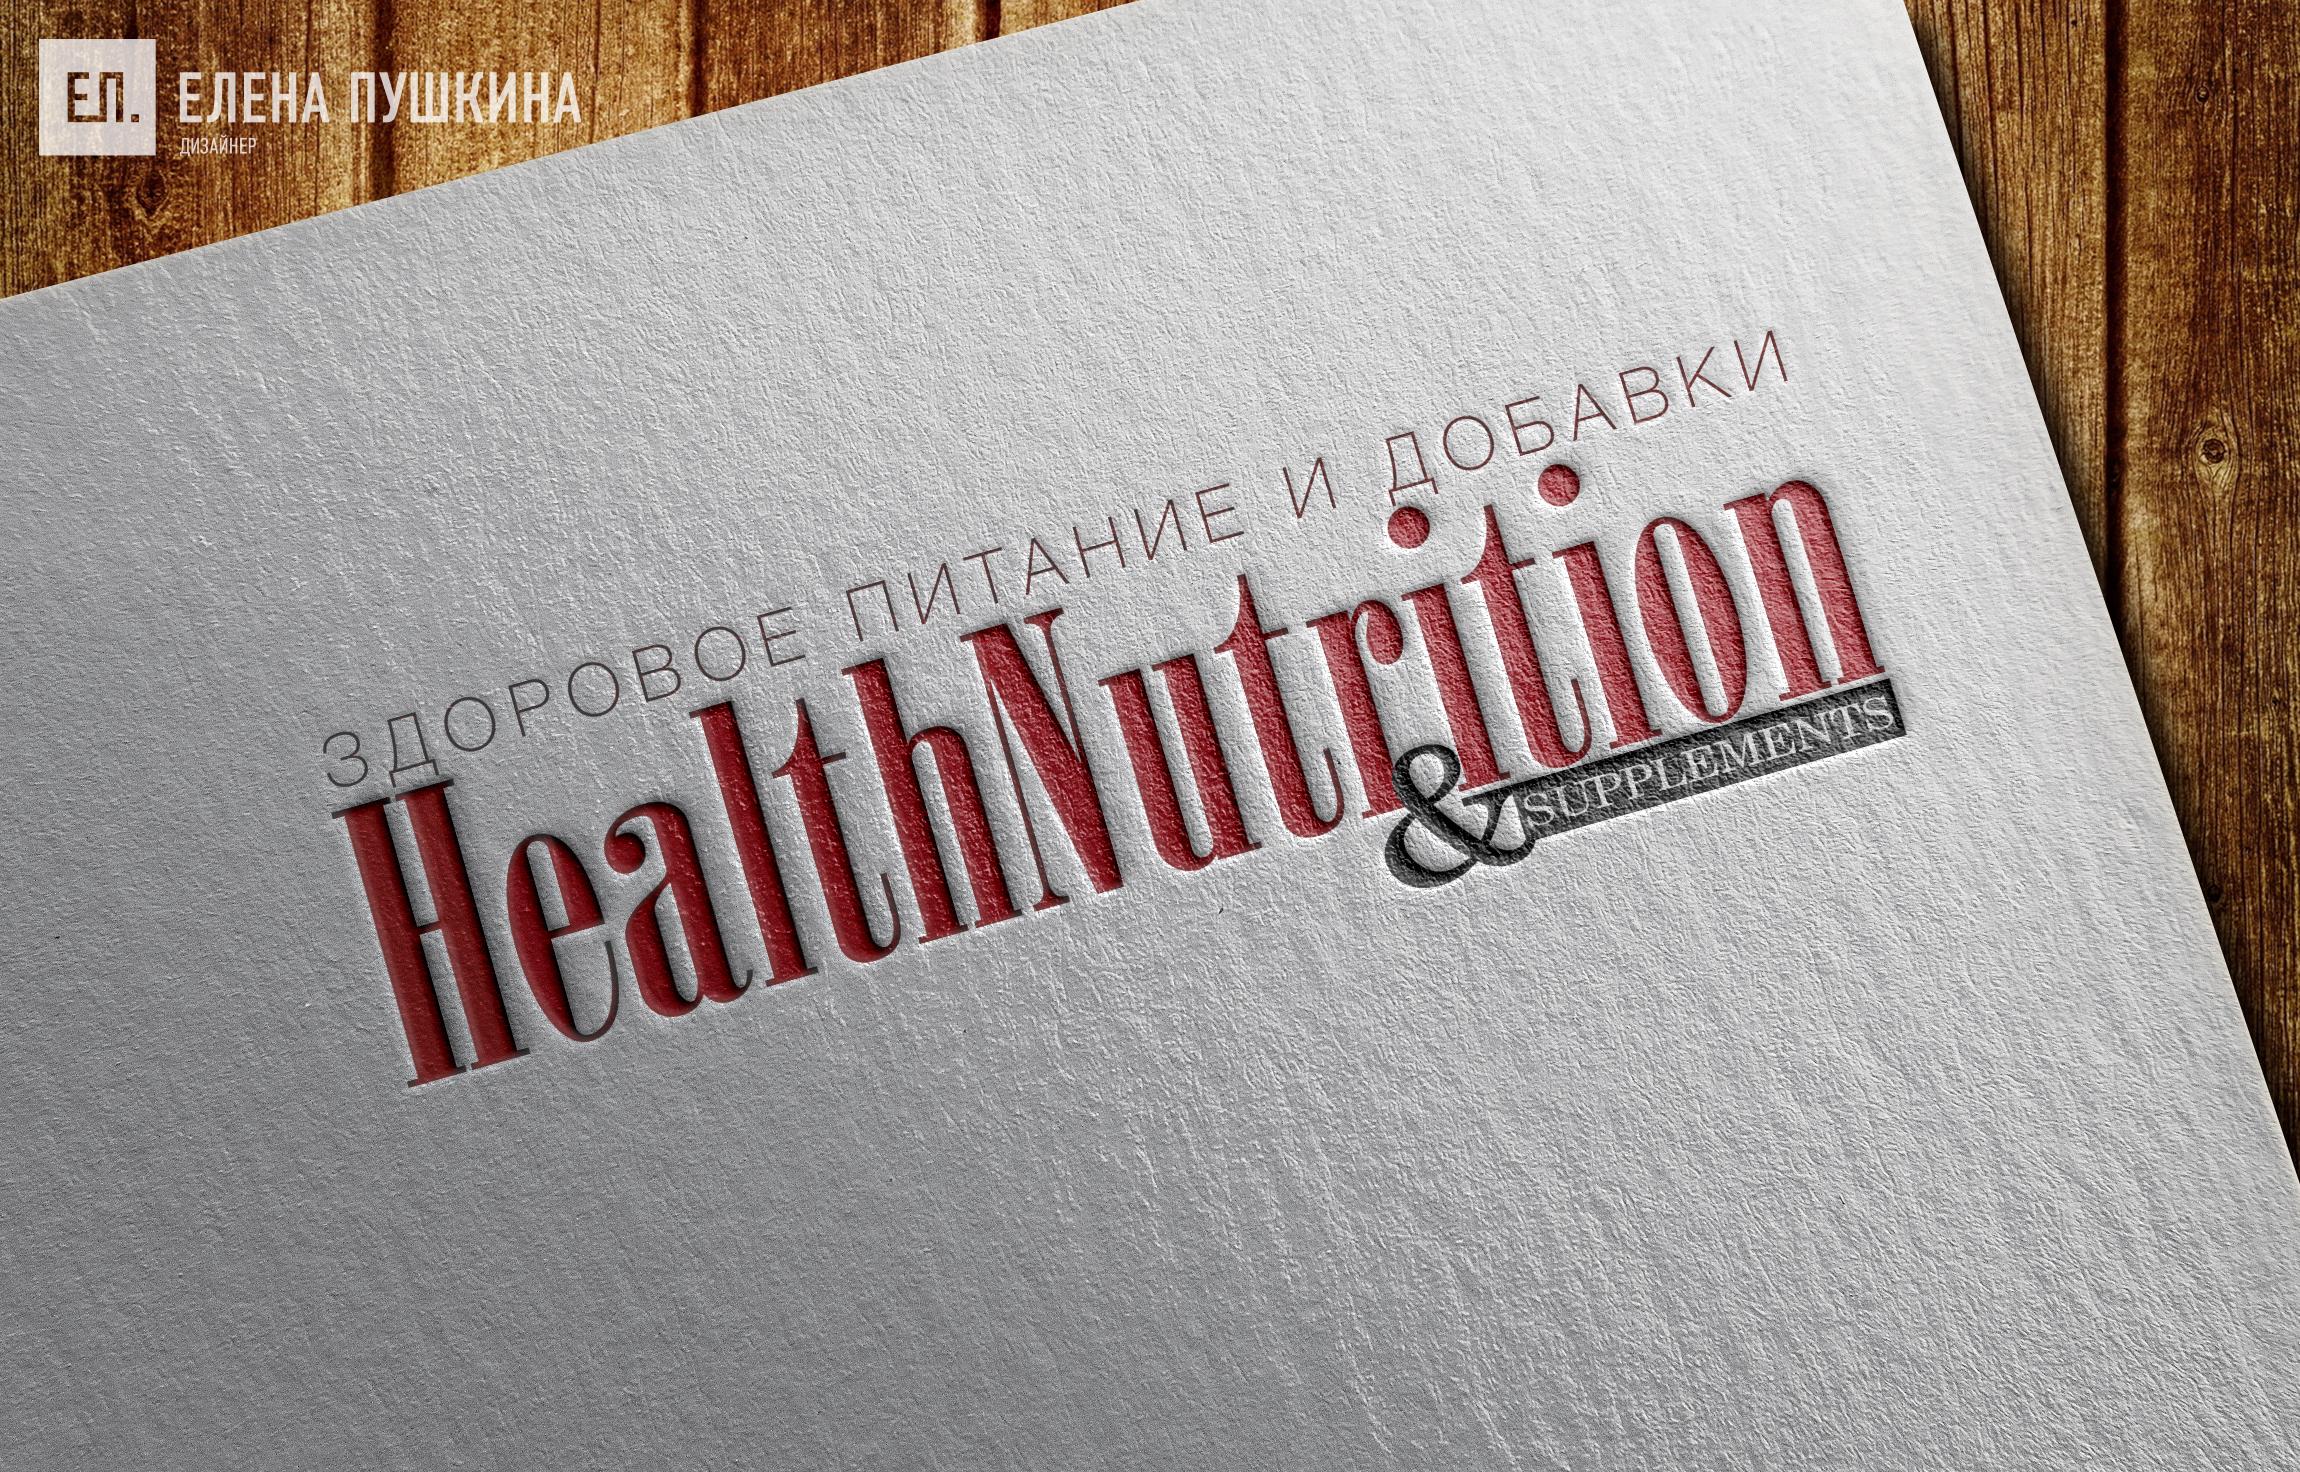 Разработка логотипа журнала «Health Nutrition & Supplements» Разработка логотипов Портфолио